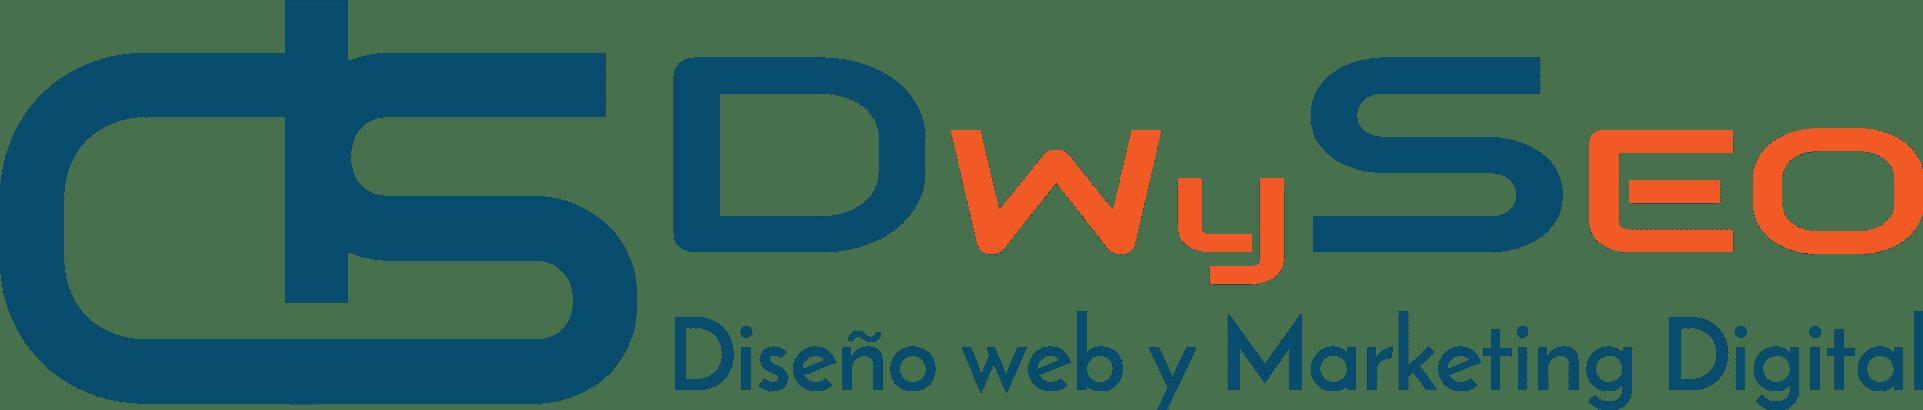 dwyseo.com Diseño web | Marketing Digital | Posicionamiento SEO | Tiendas online